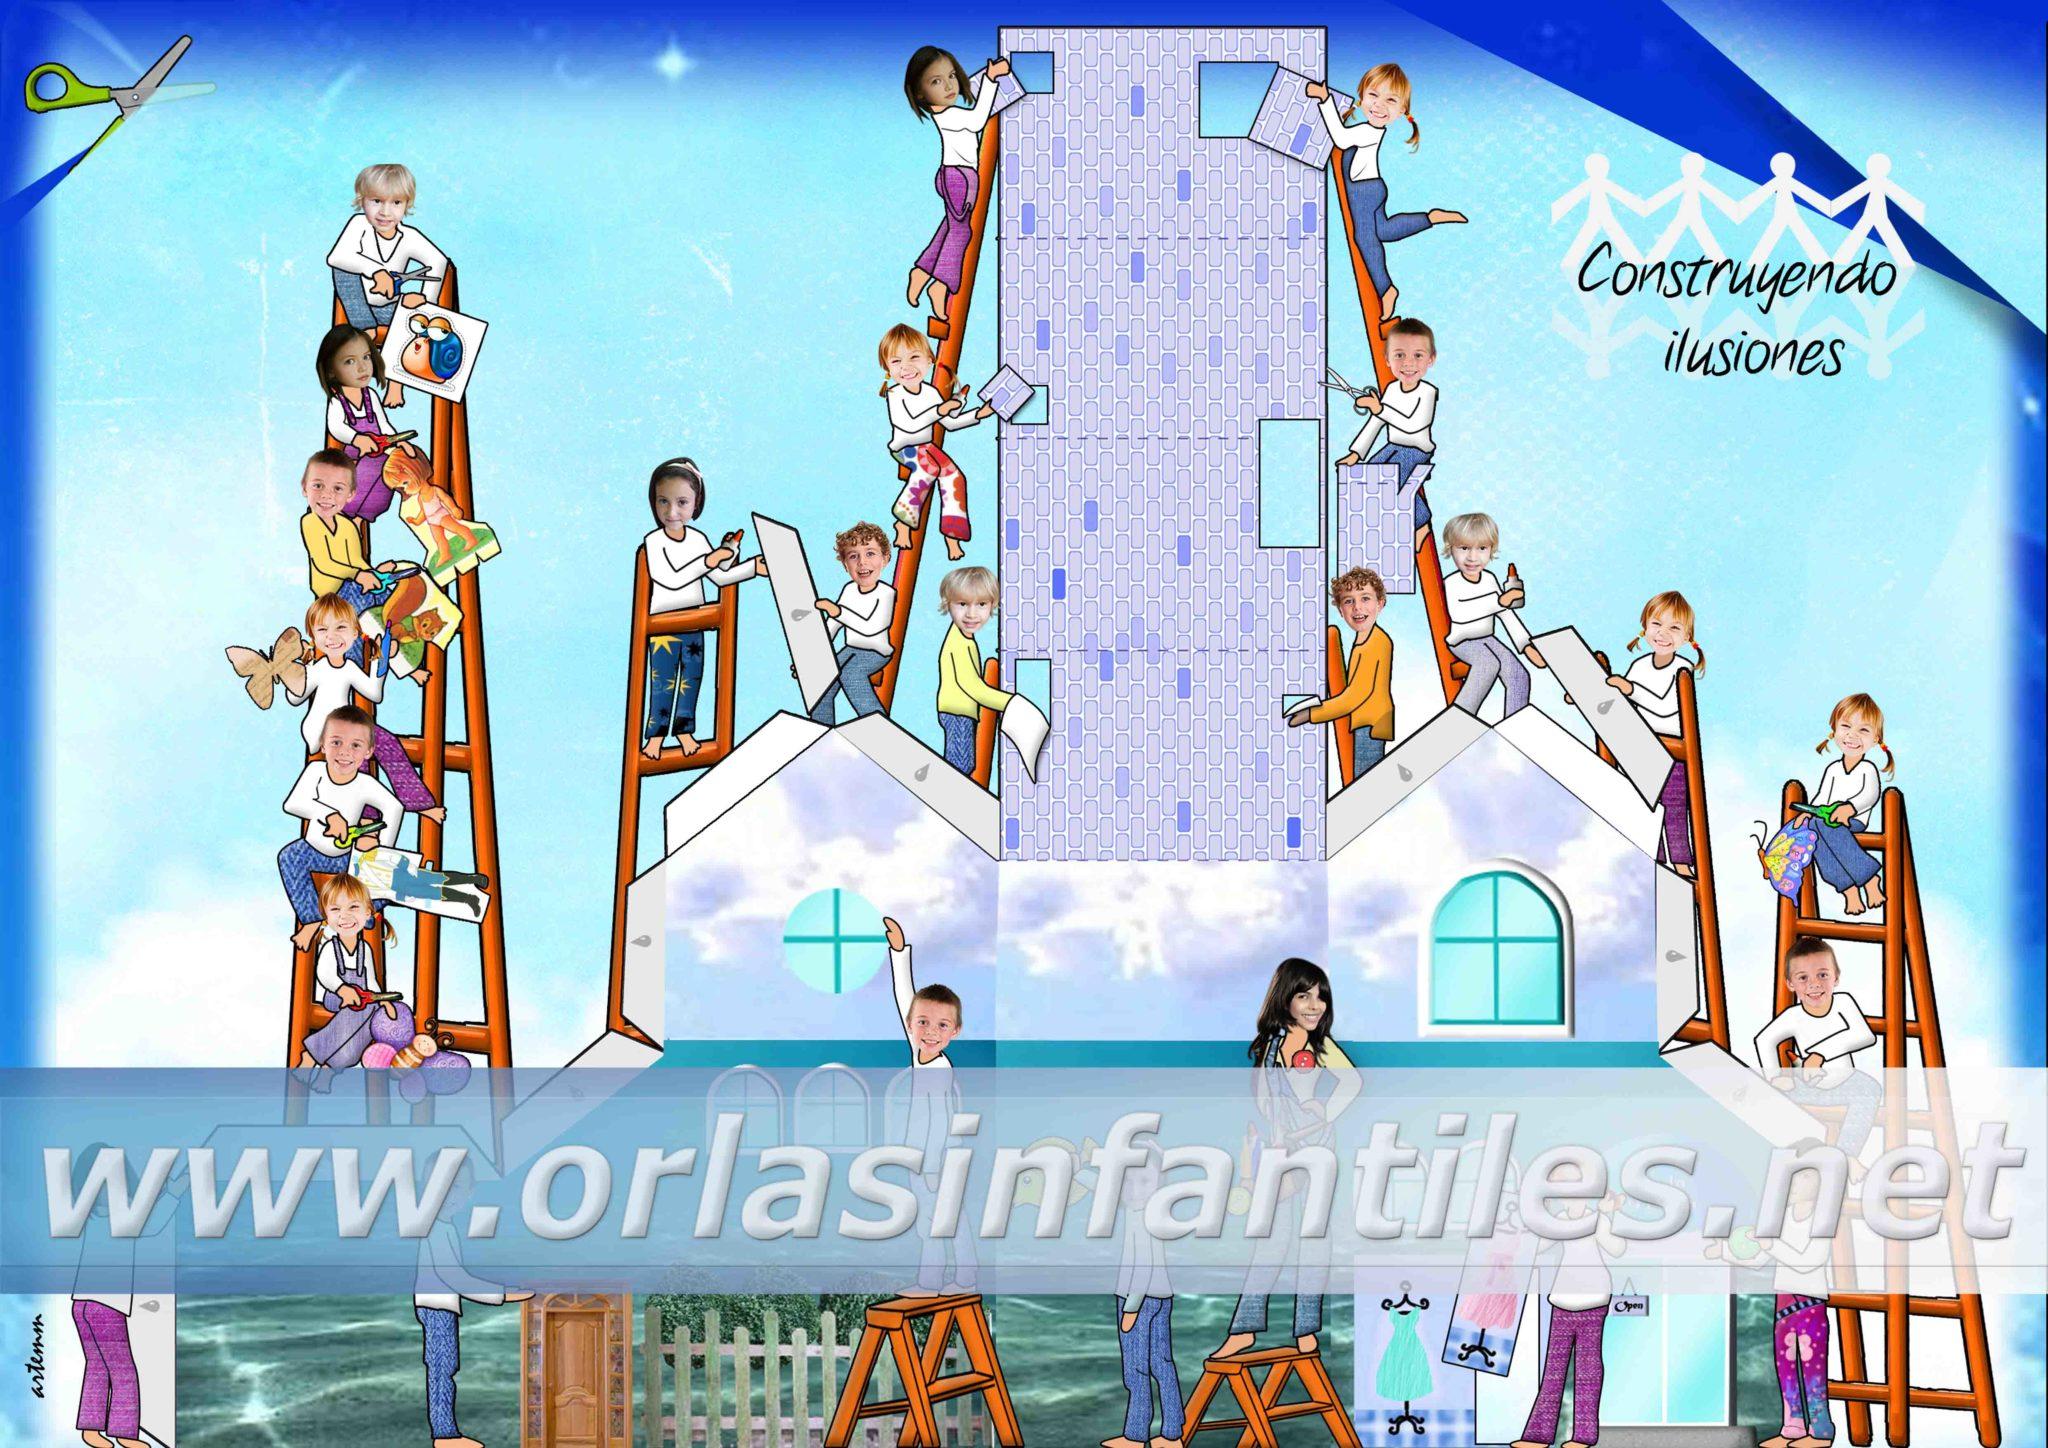 ORLA CONSTRUYENDO ILUSIONES